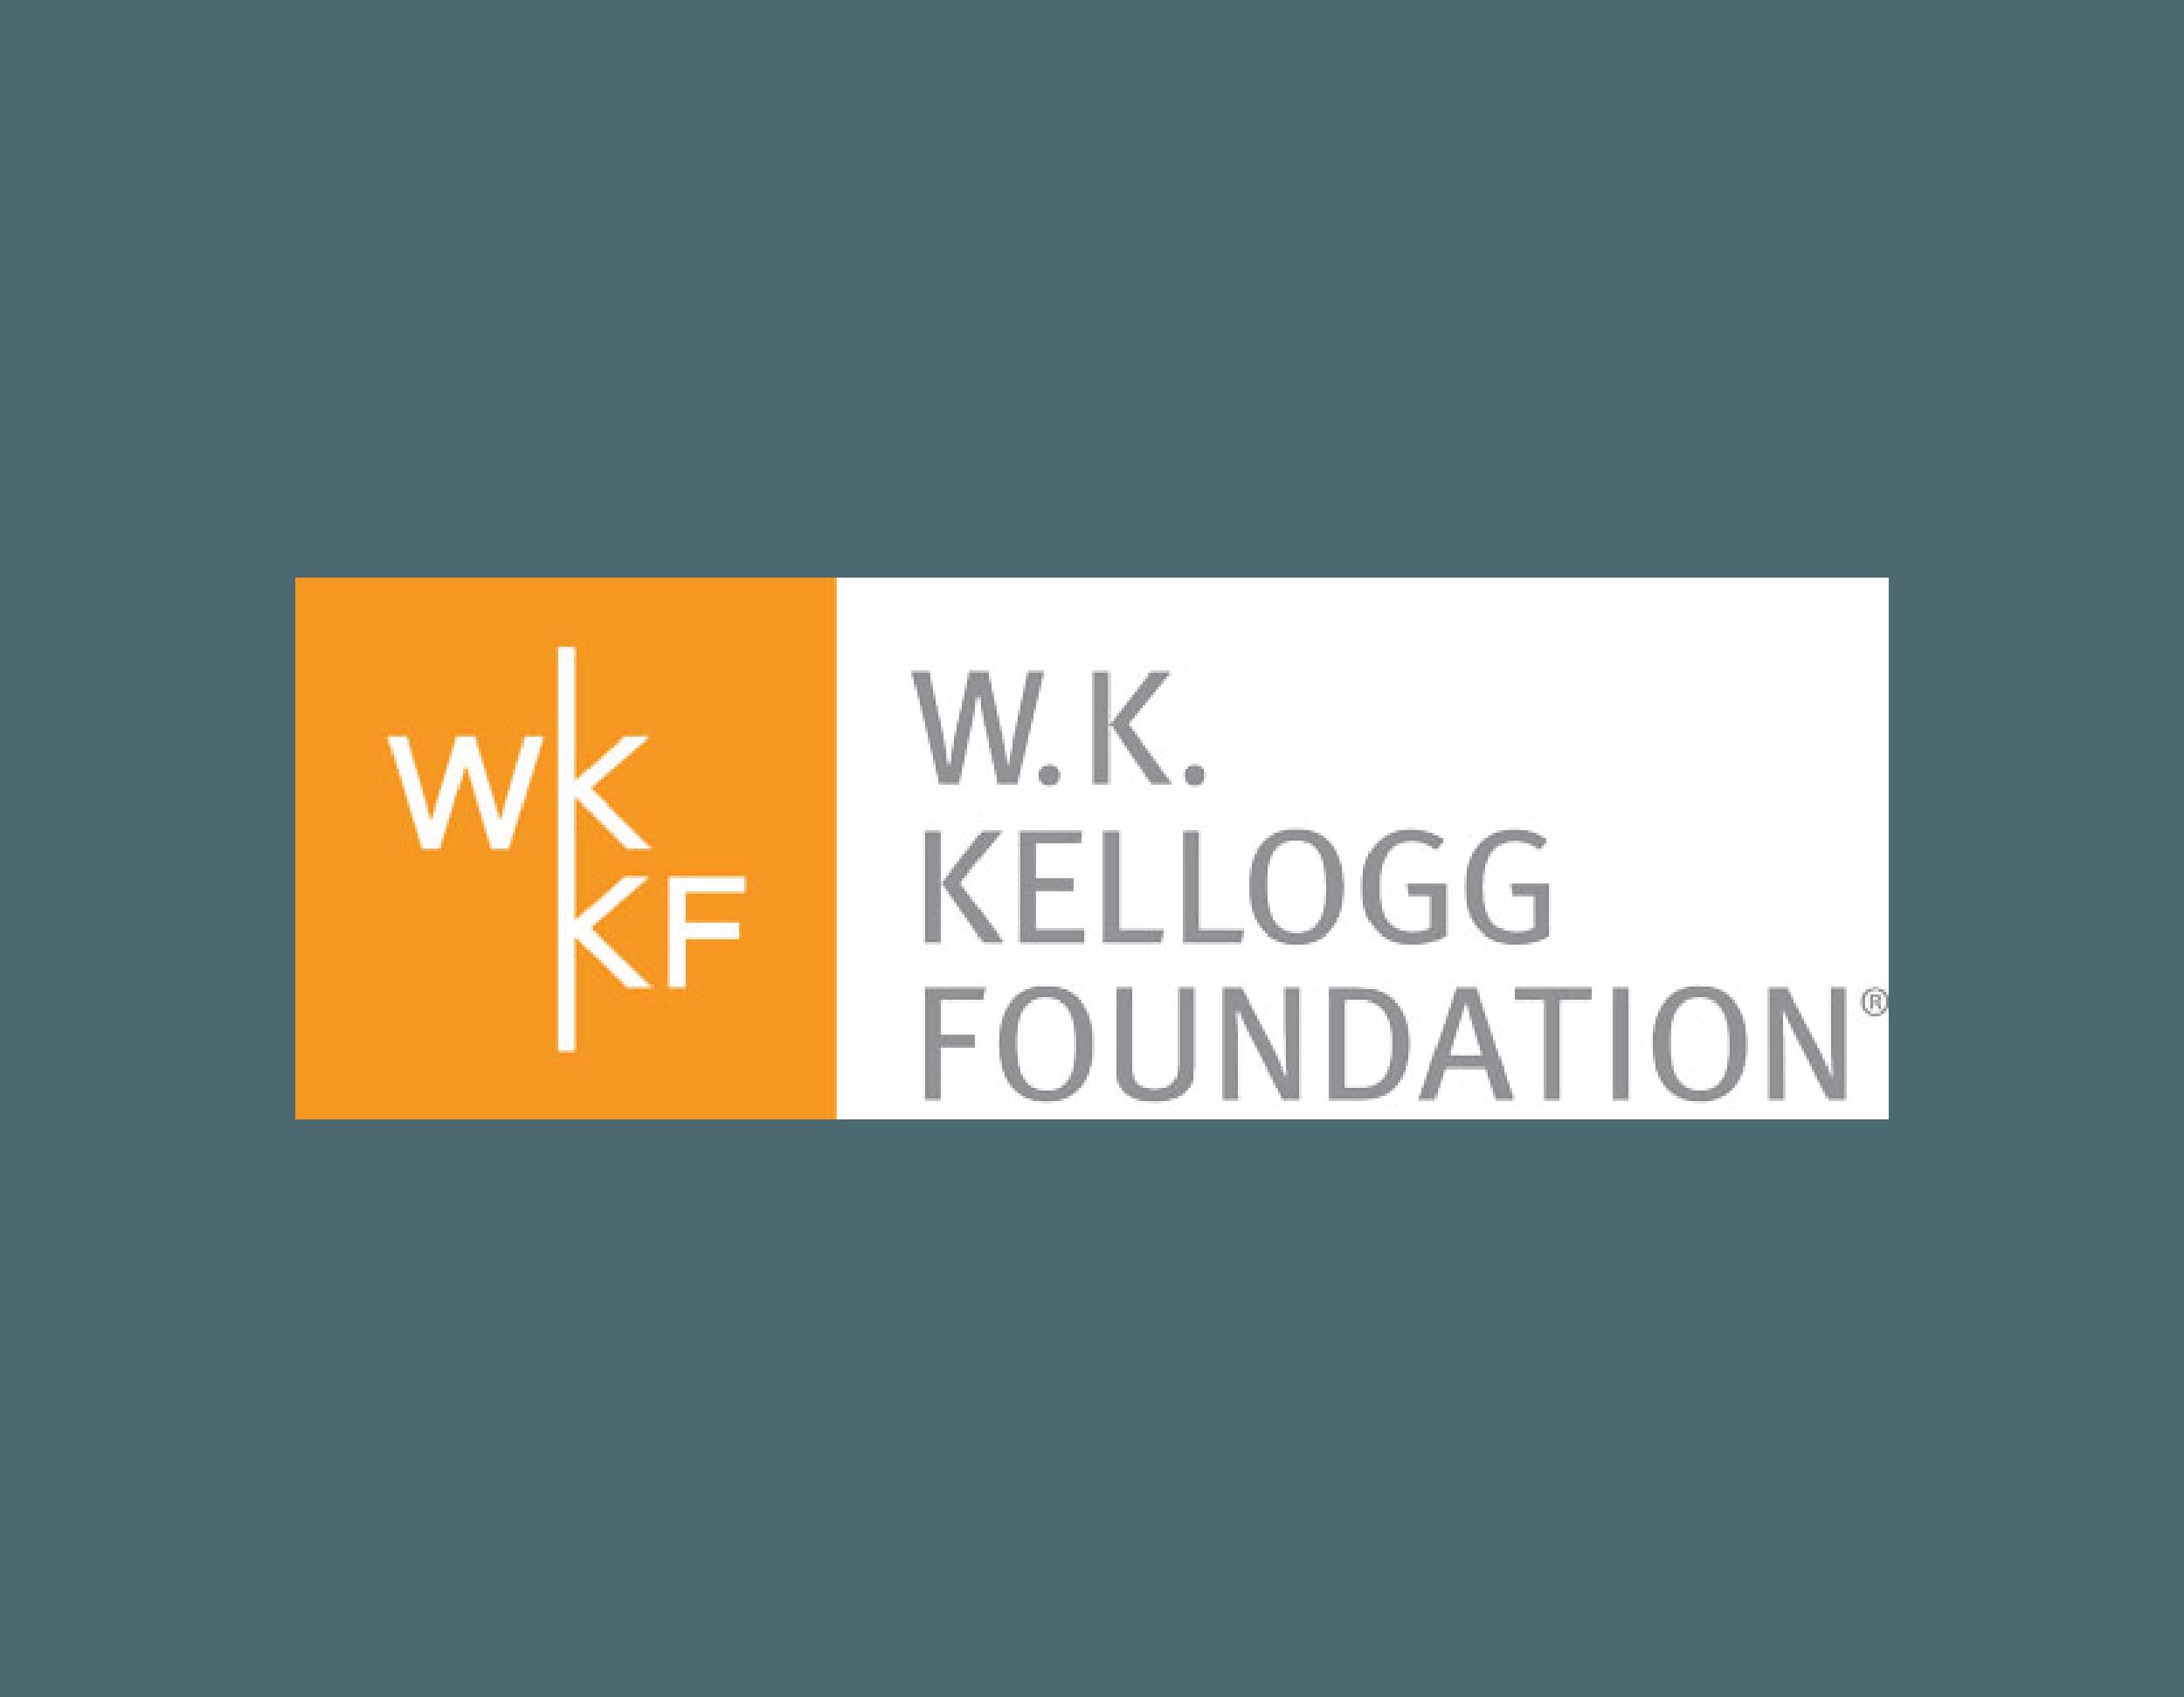 WK Kellogg@300x-8.png